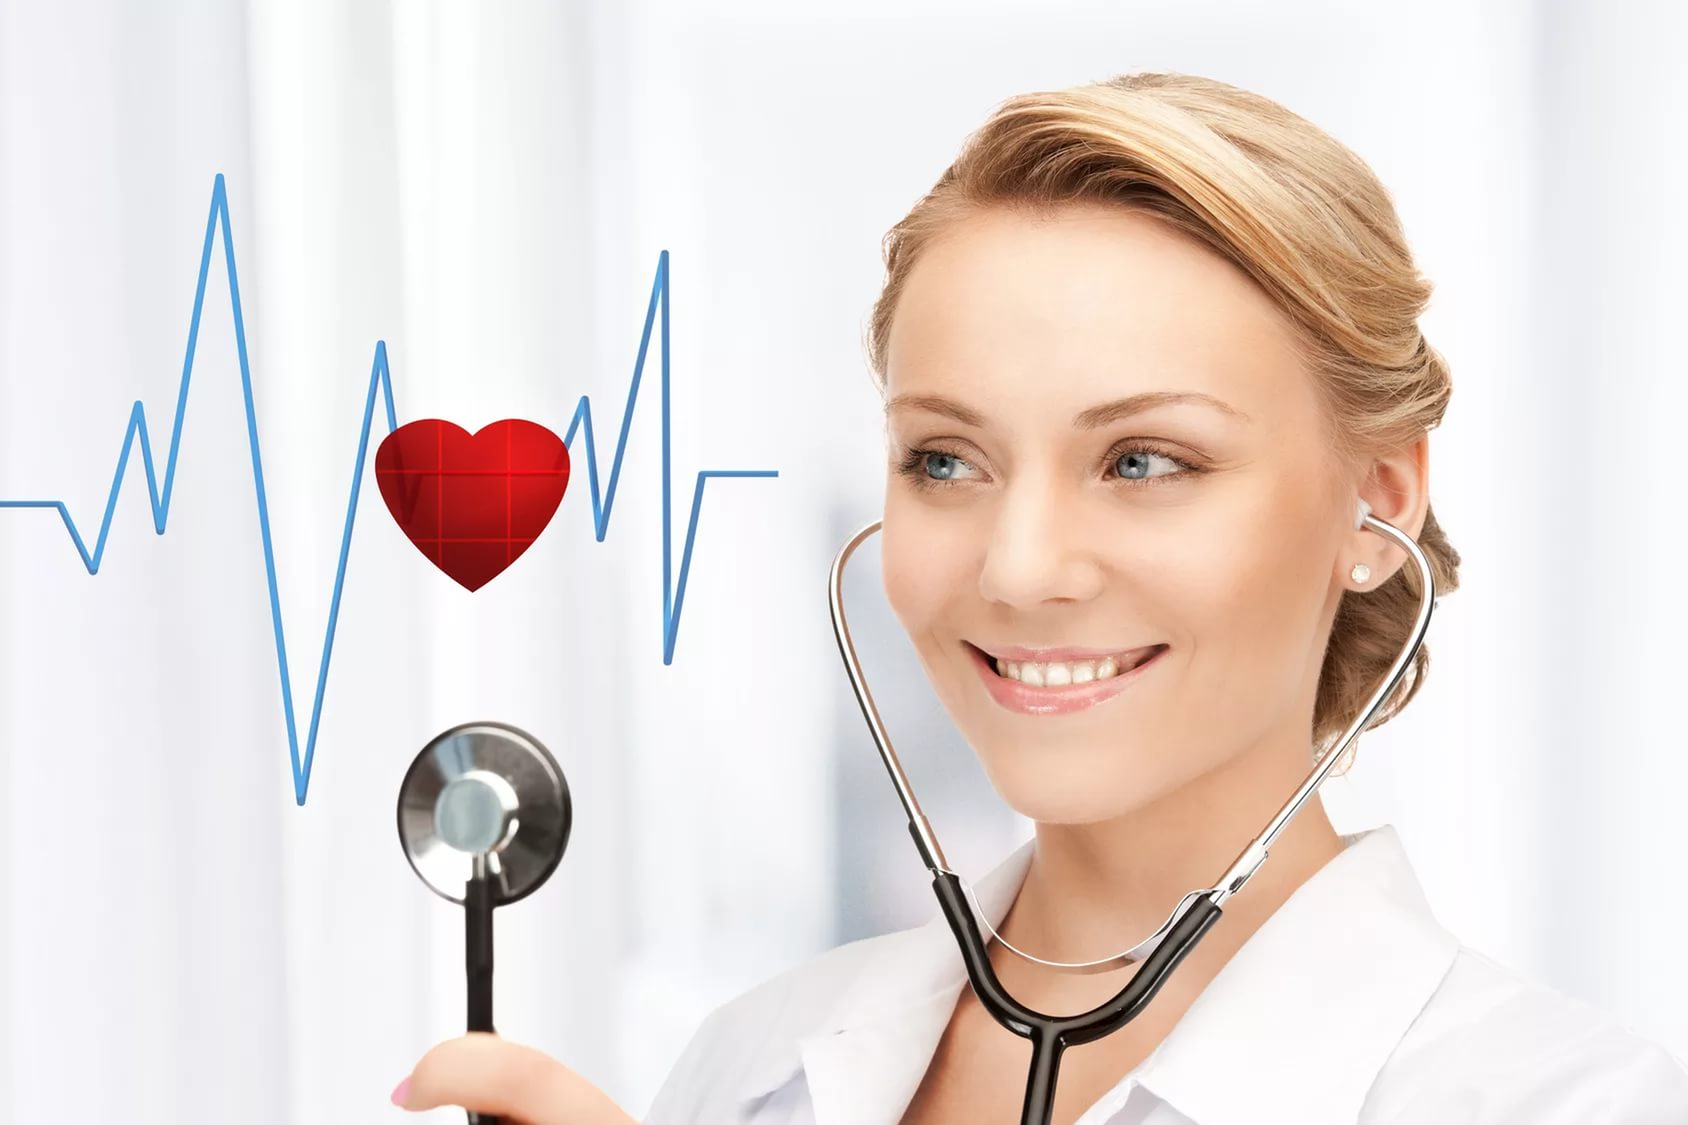 В Северодонецке хотят открыть кардиоцентр